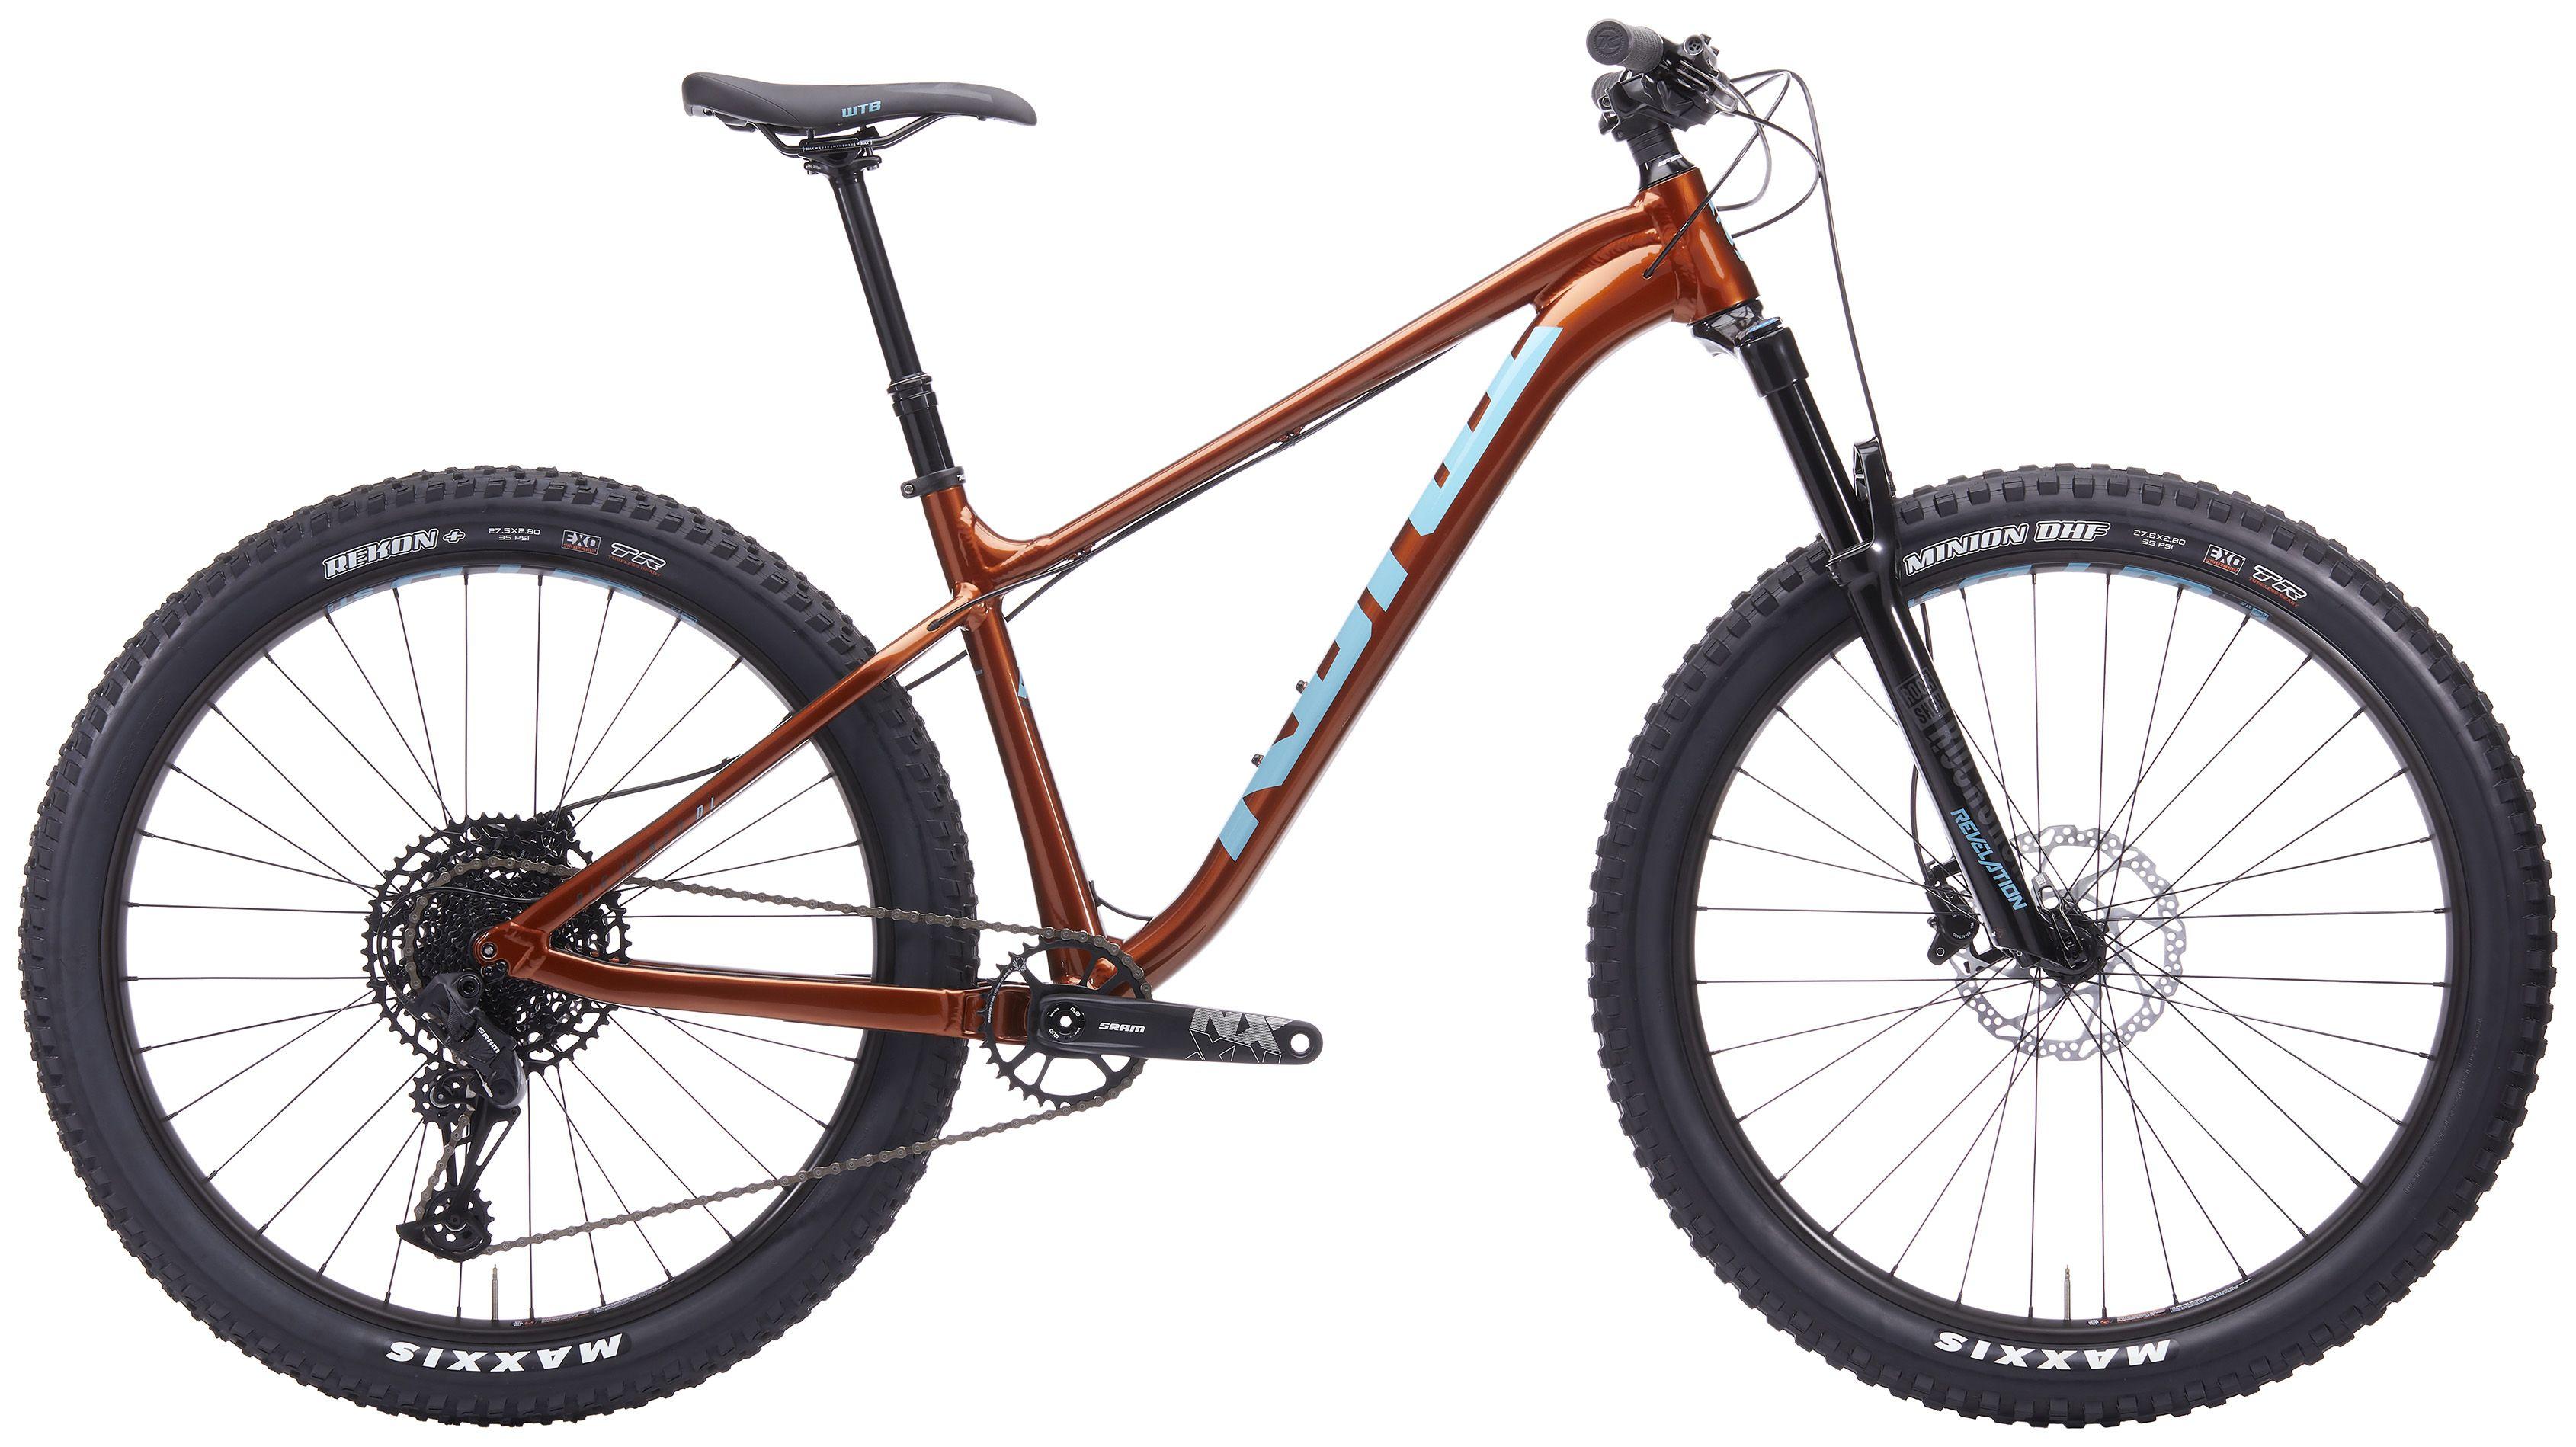 Kona Big Honzo Dl 650 Mountain Bike 2020 | Mountainbikes